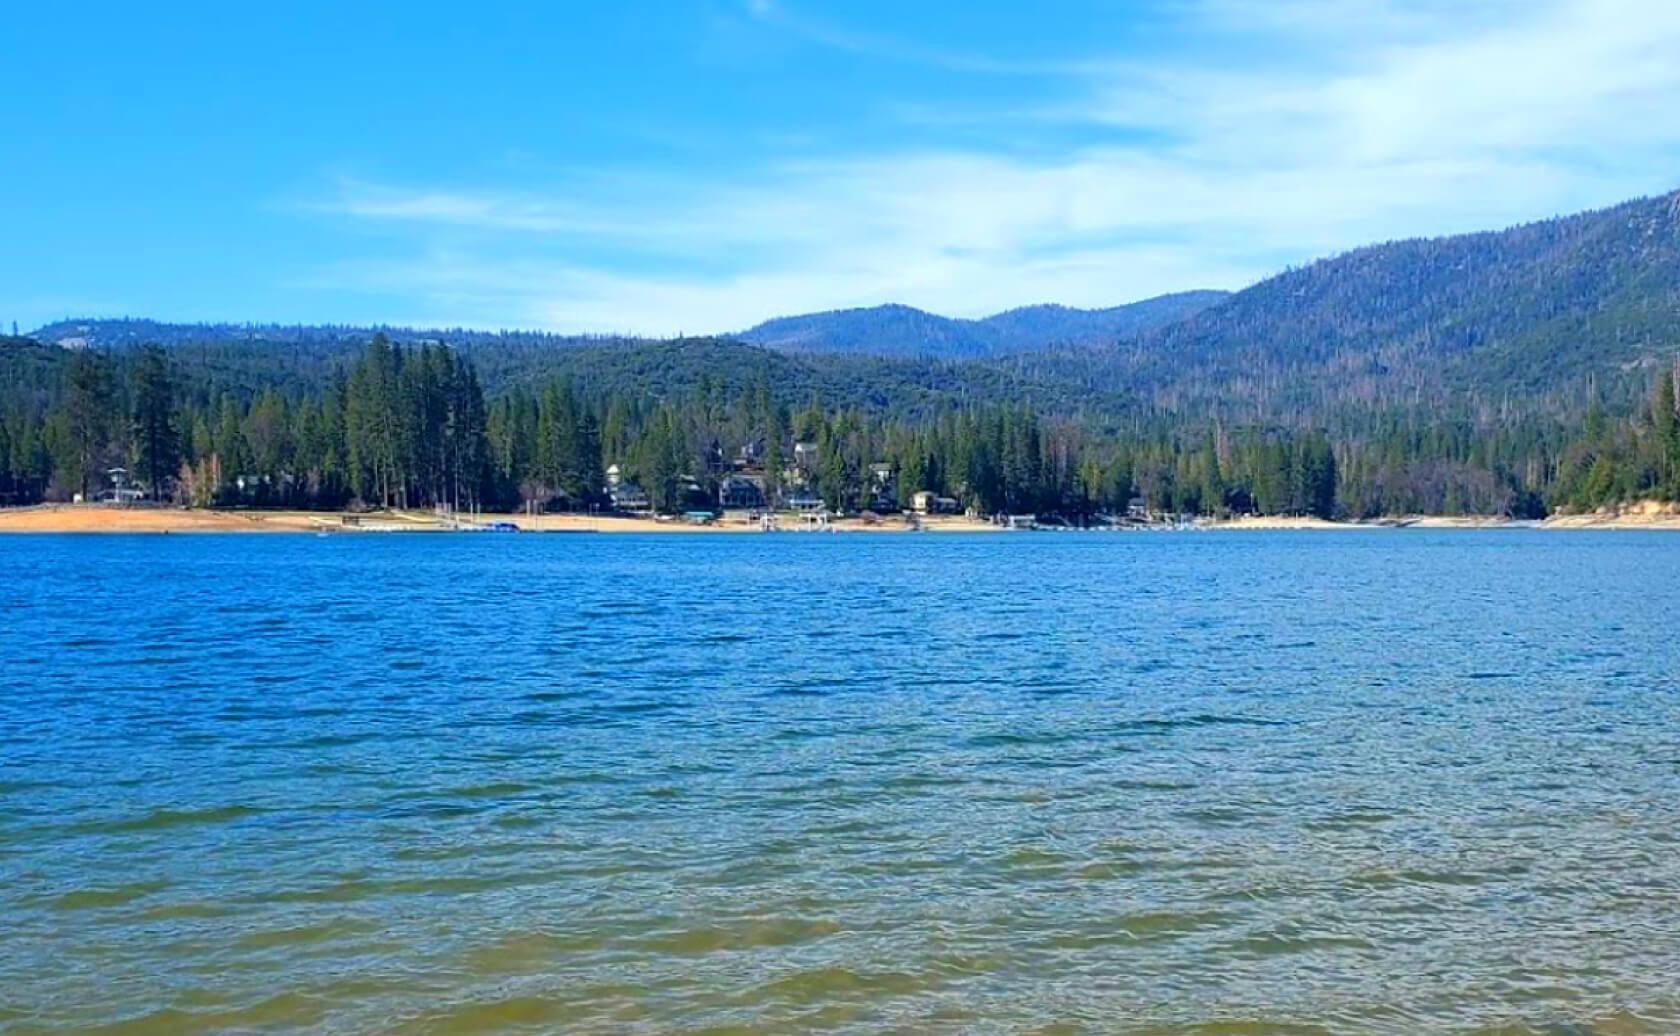 Bass-Lake-Reservoir-Fishing-Guide-Report-California-01